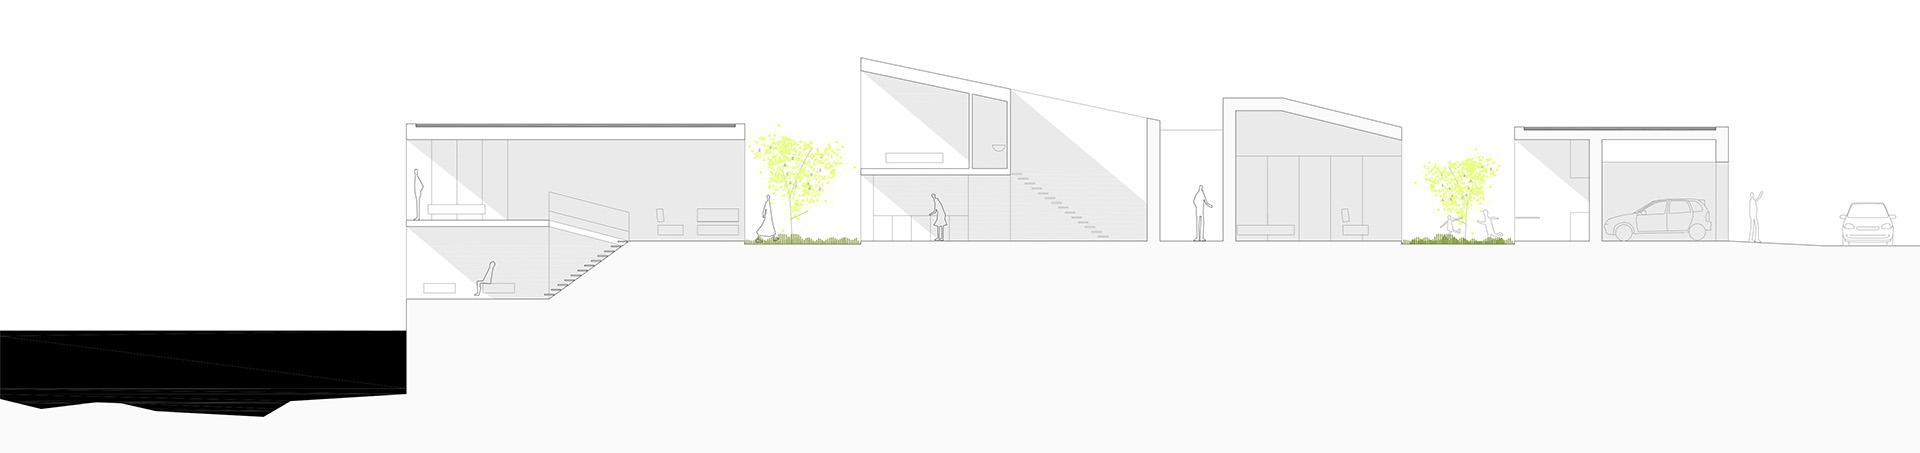 04_PLAYstudio-stavanger-lervig-housing